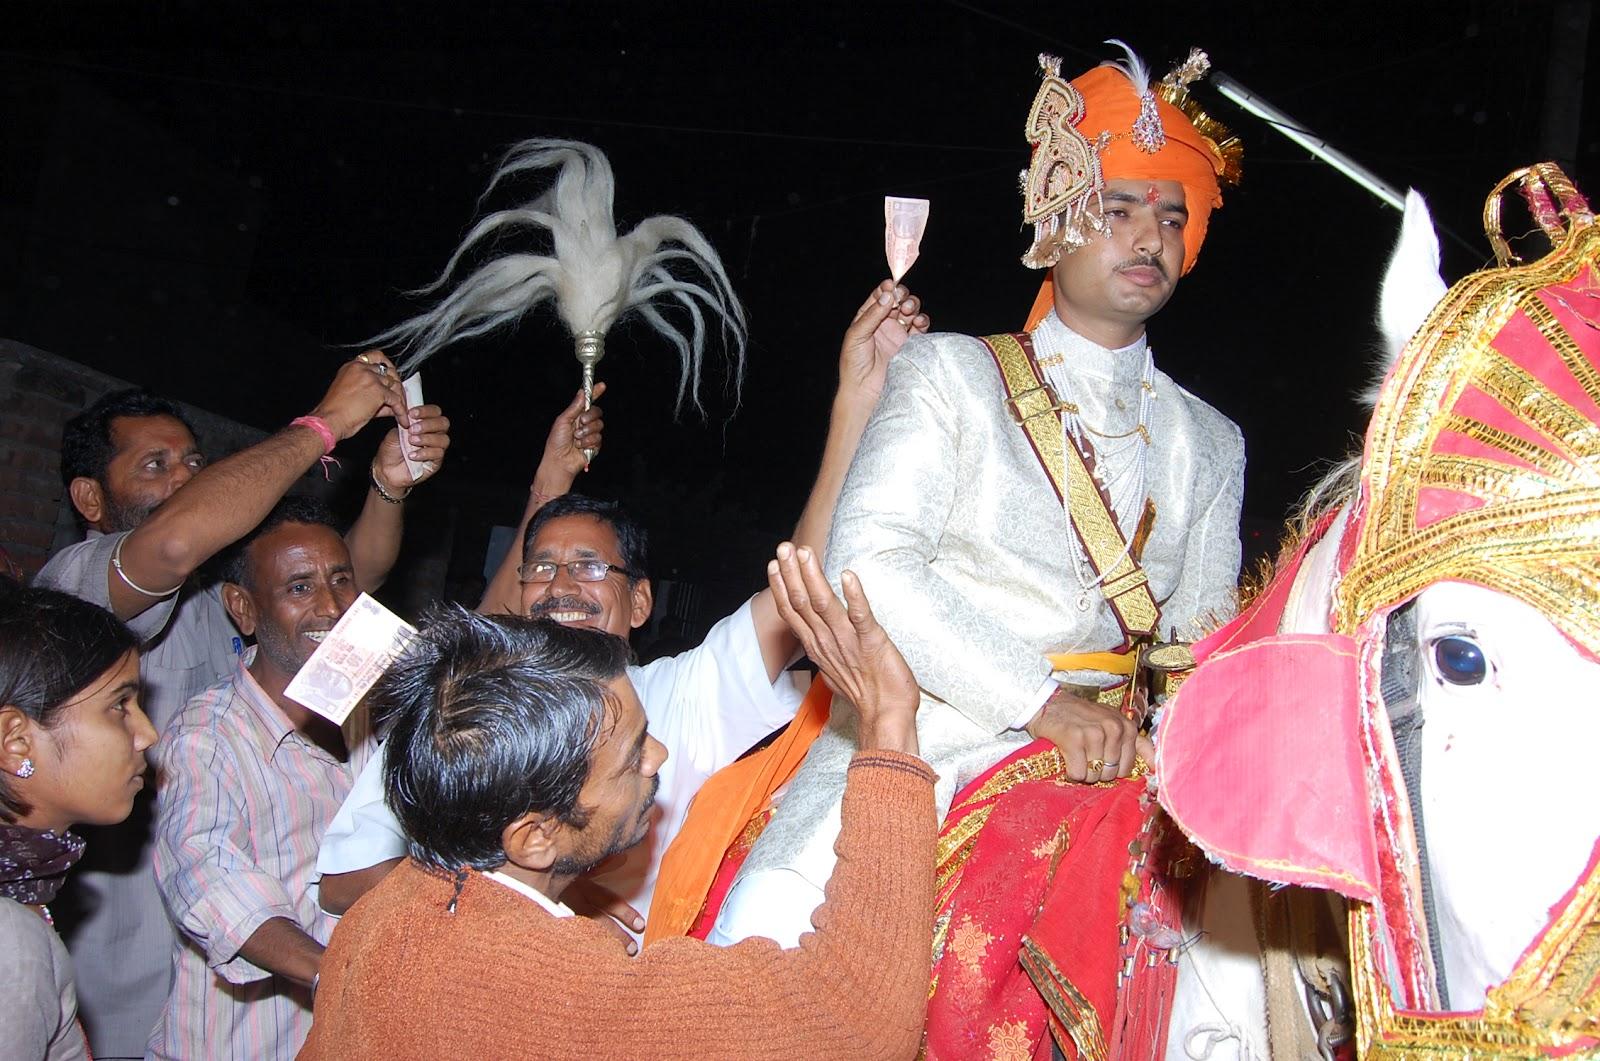 RAJPUT WEDDING CUSTOMS & RITUALS | Rajput Parinay (Vivaah - Bandhan)